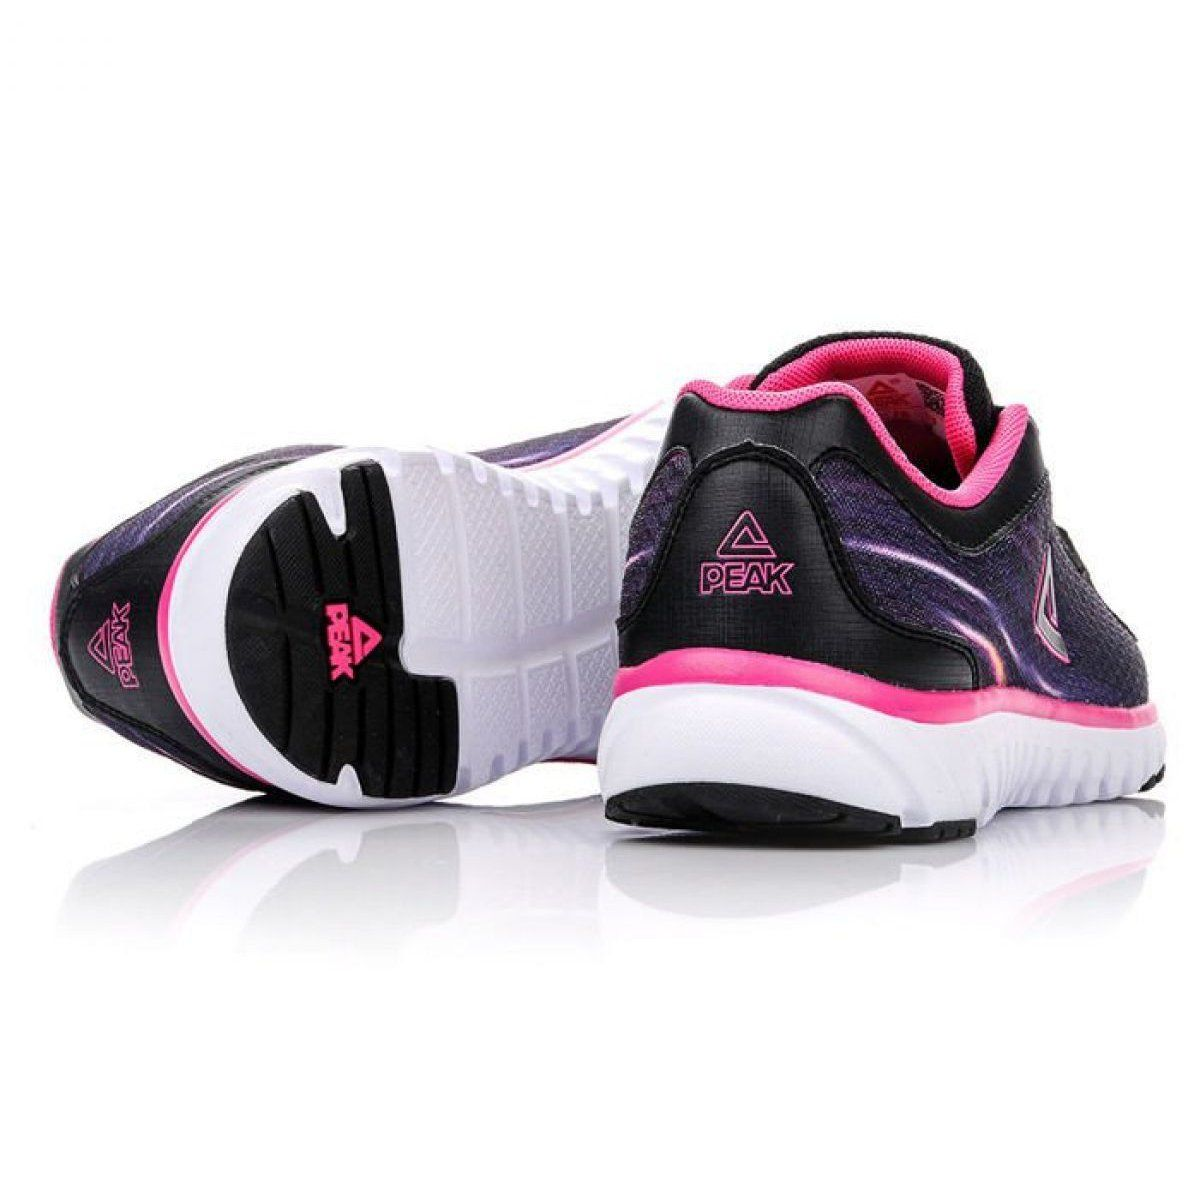 Olimp Buty Biegowe Peak E52178h W 62886 62889 Czarne Rozowe Rose Shoes Womens Running Shoes Running Shoes